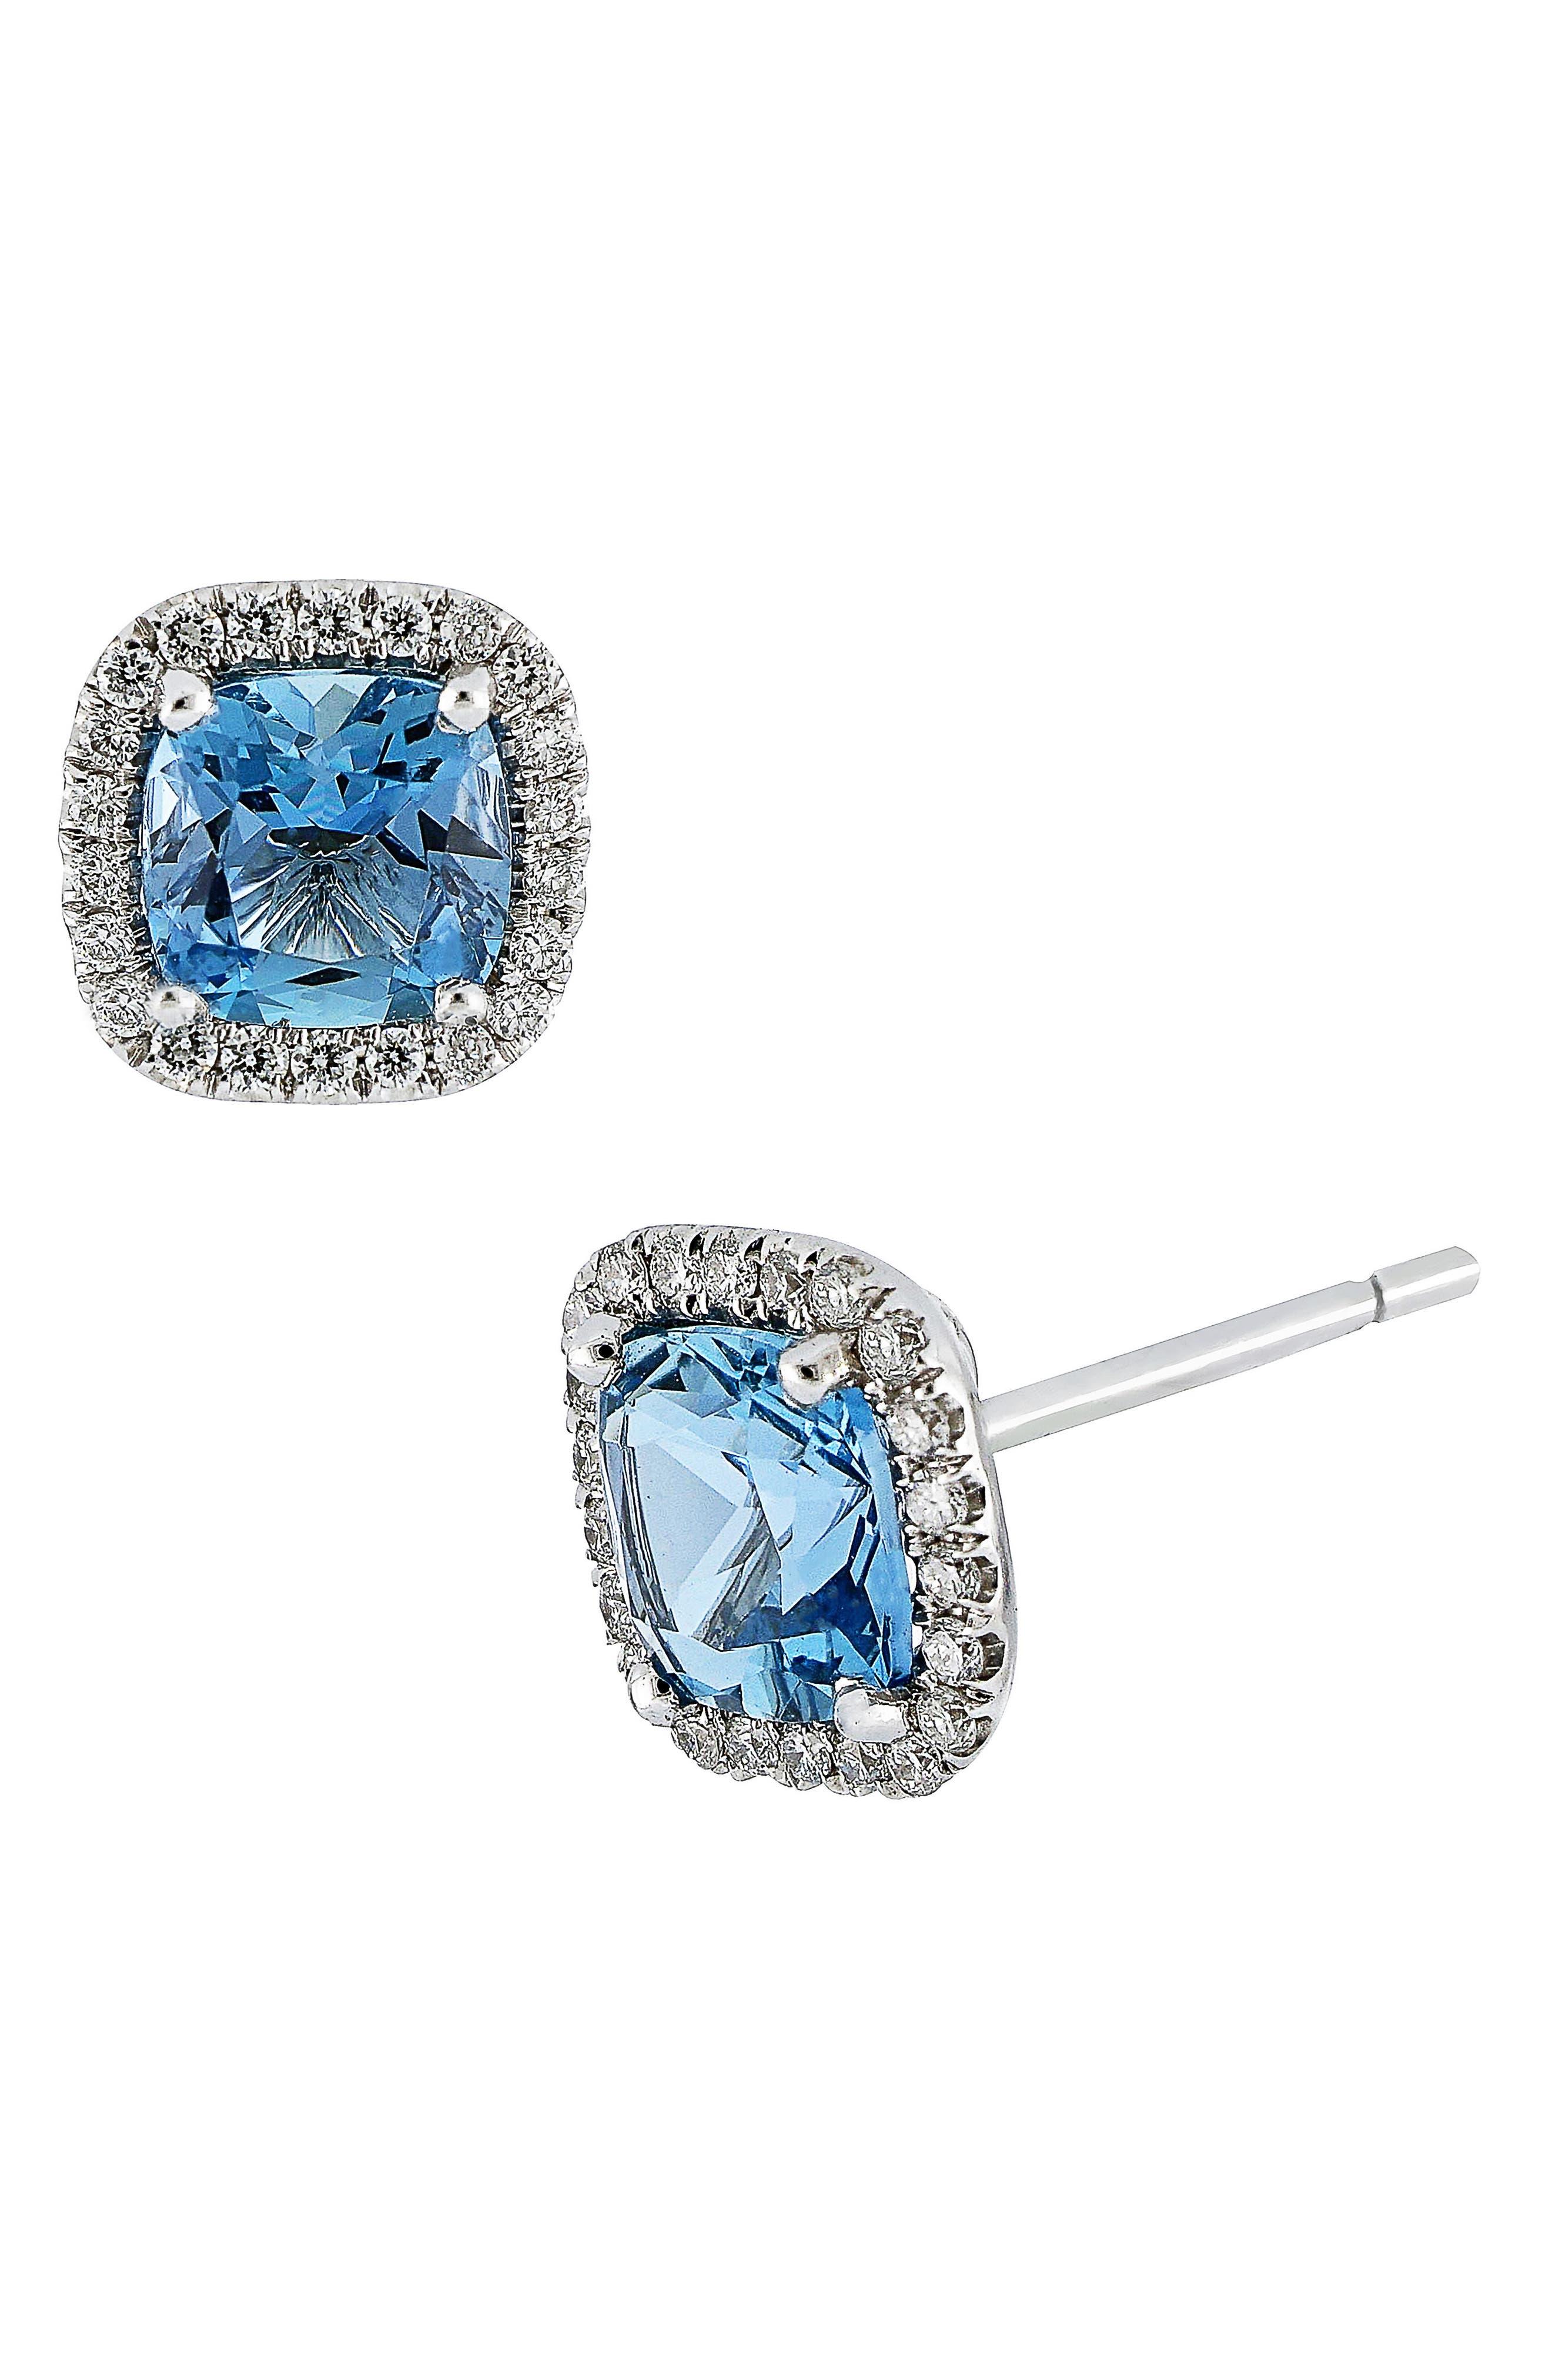 Main Image - Bony Levy Aquamarine & Diamond Earrings (Nordstrom Exclusive)